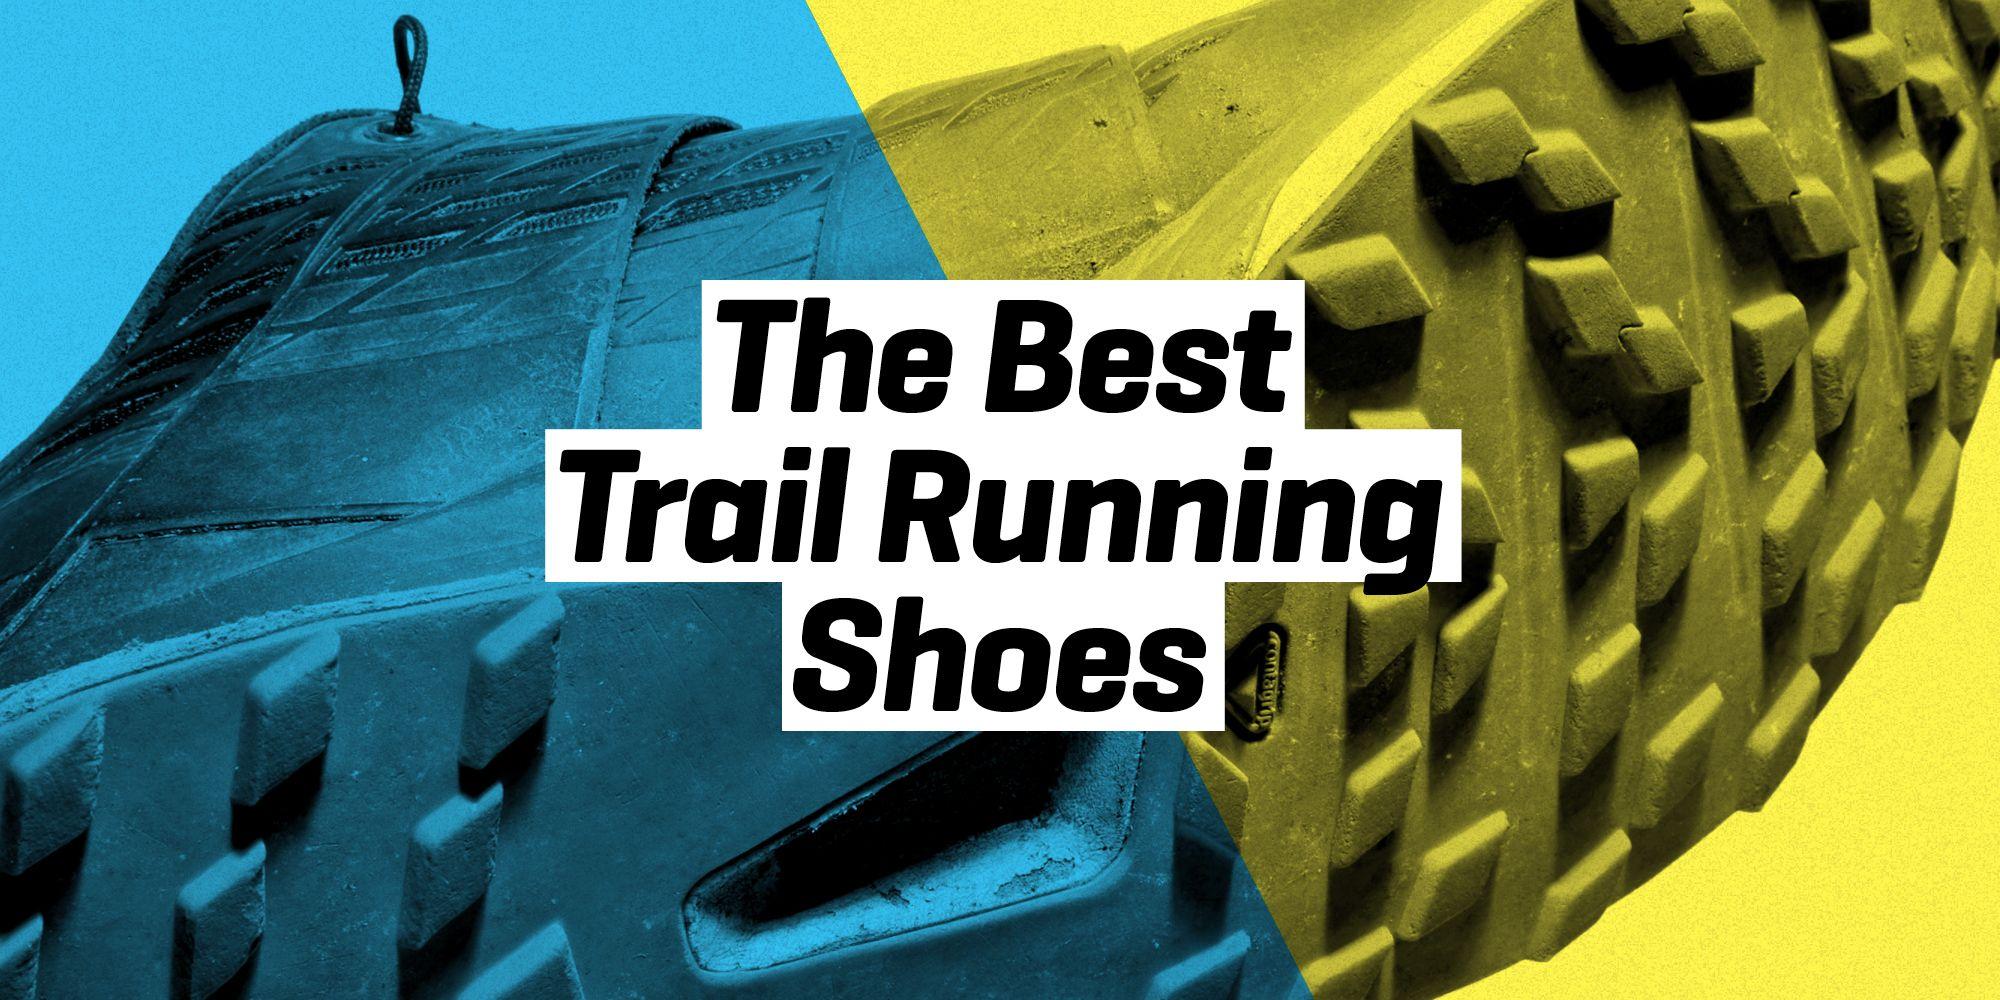 Best Trail Running Shoes 2021 Best Trail Running Shoes 2020 | Best Off Road Running Shoes